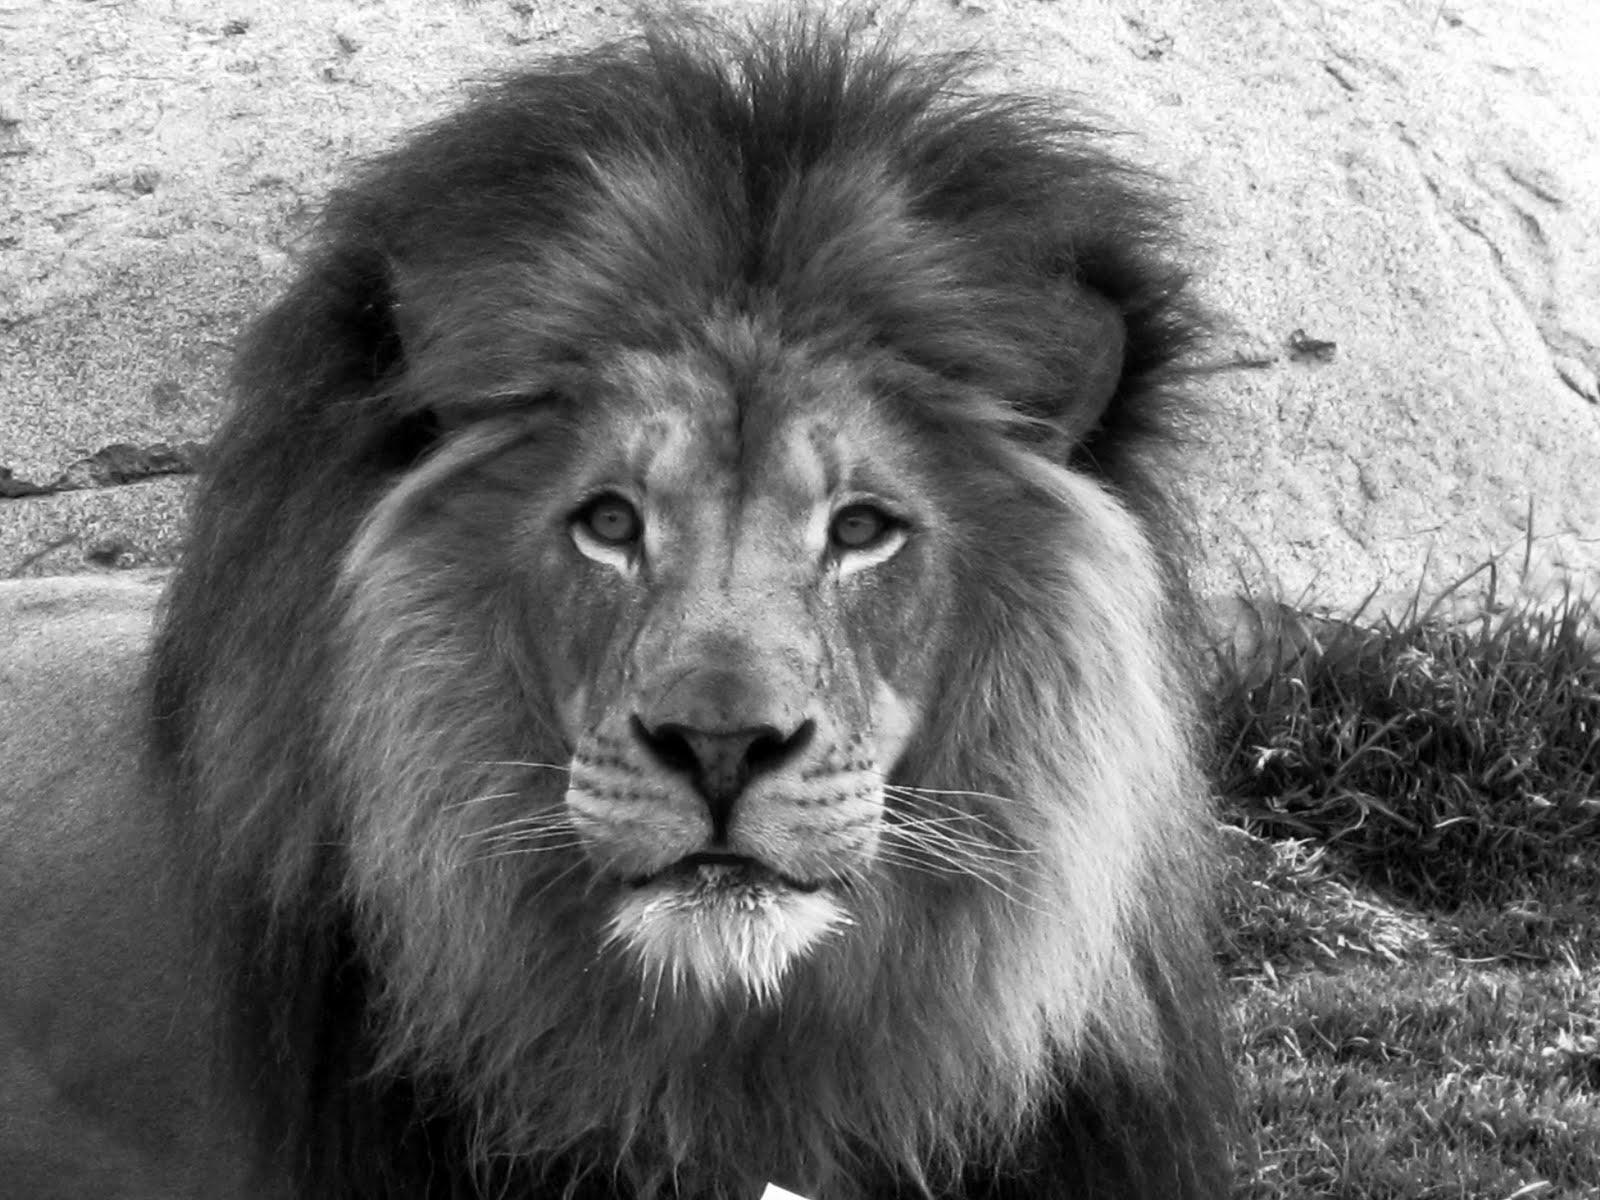 Random Ramblings: My Lion